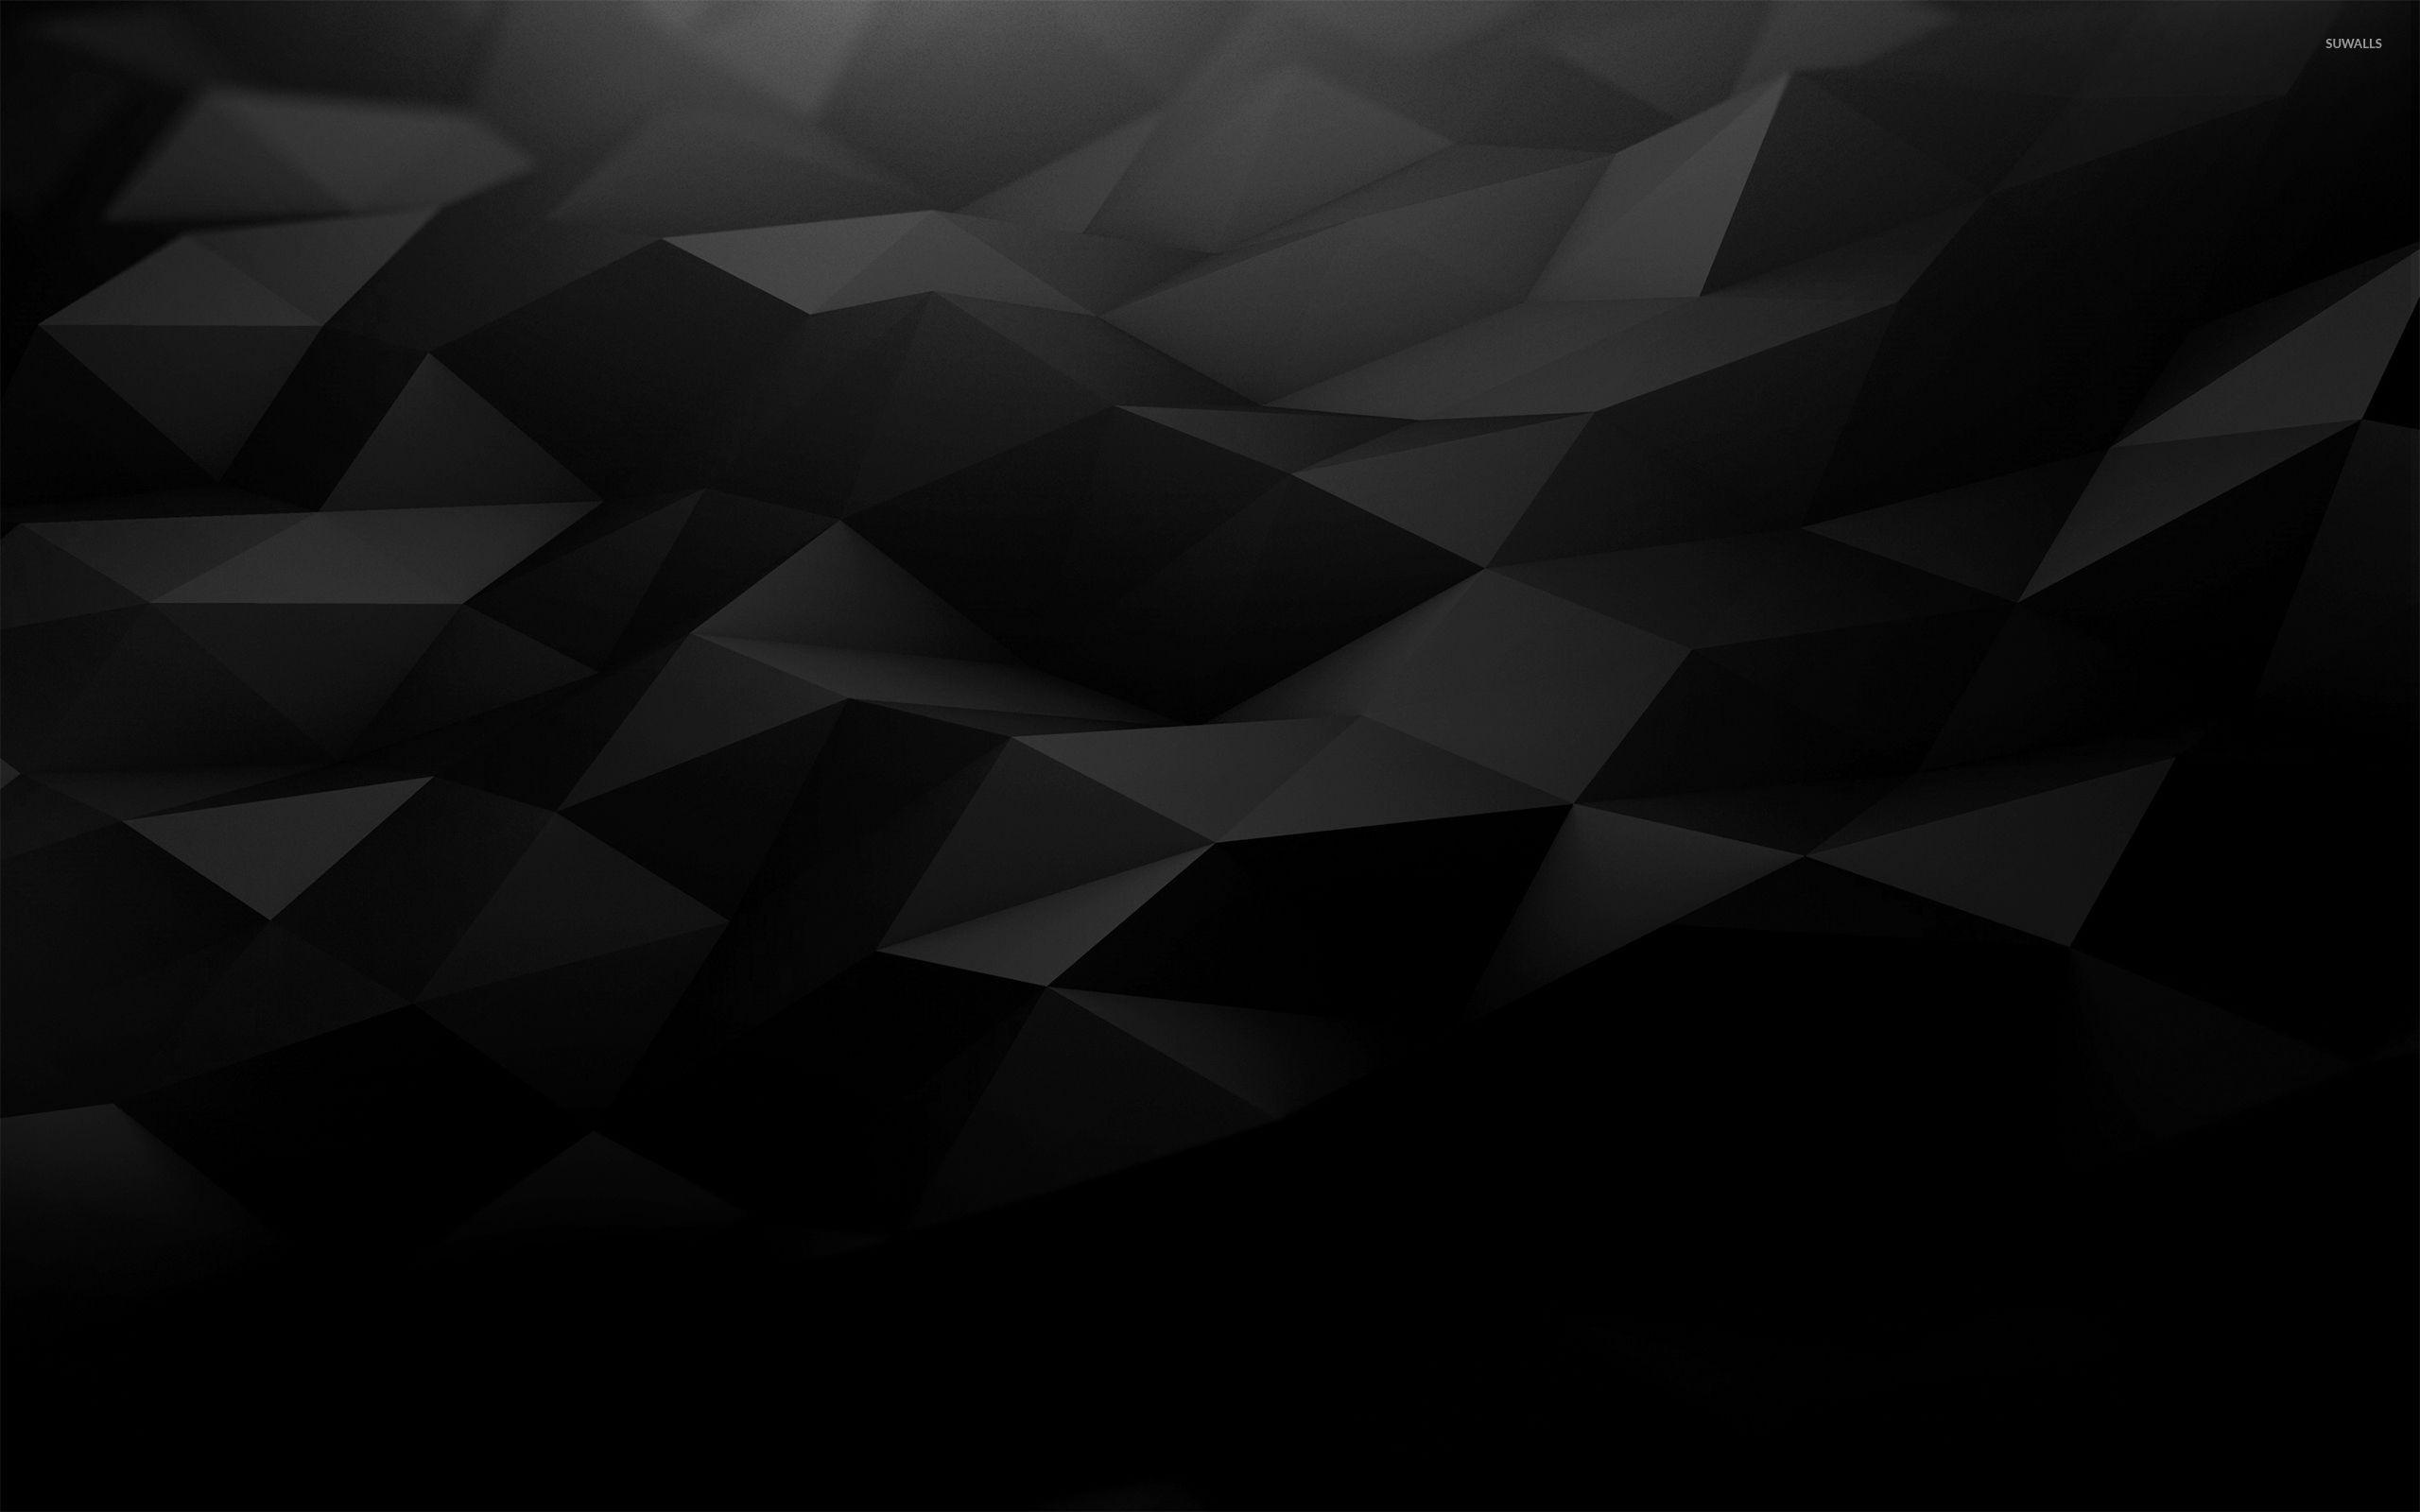 Polygon wallpaper jpg